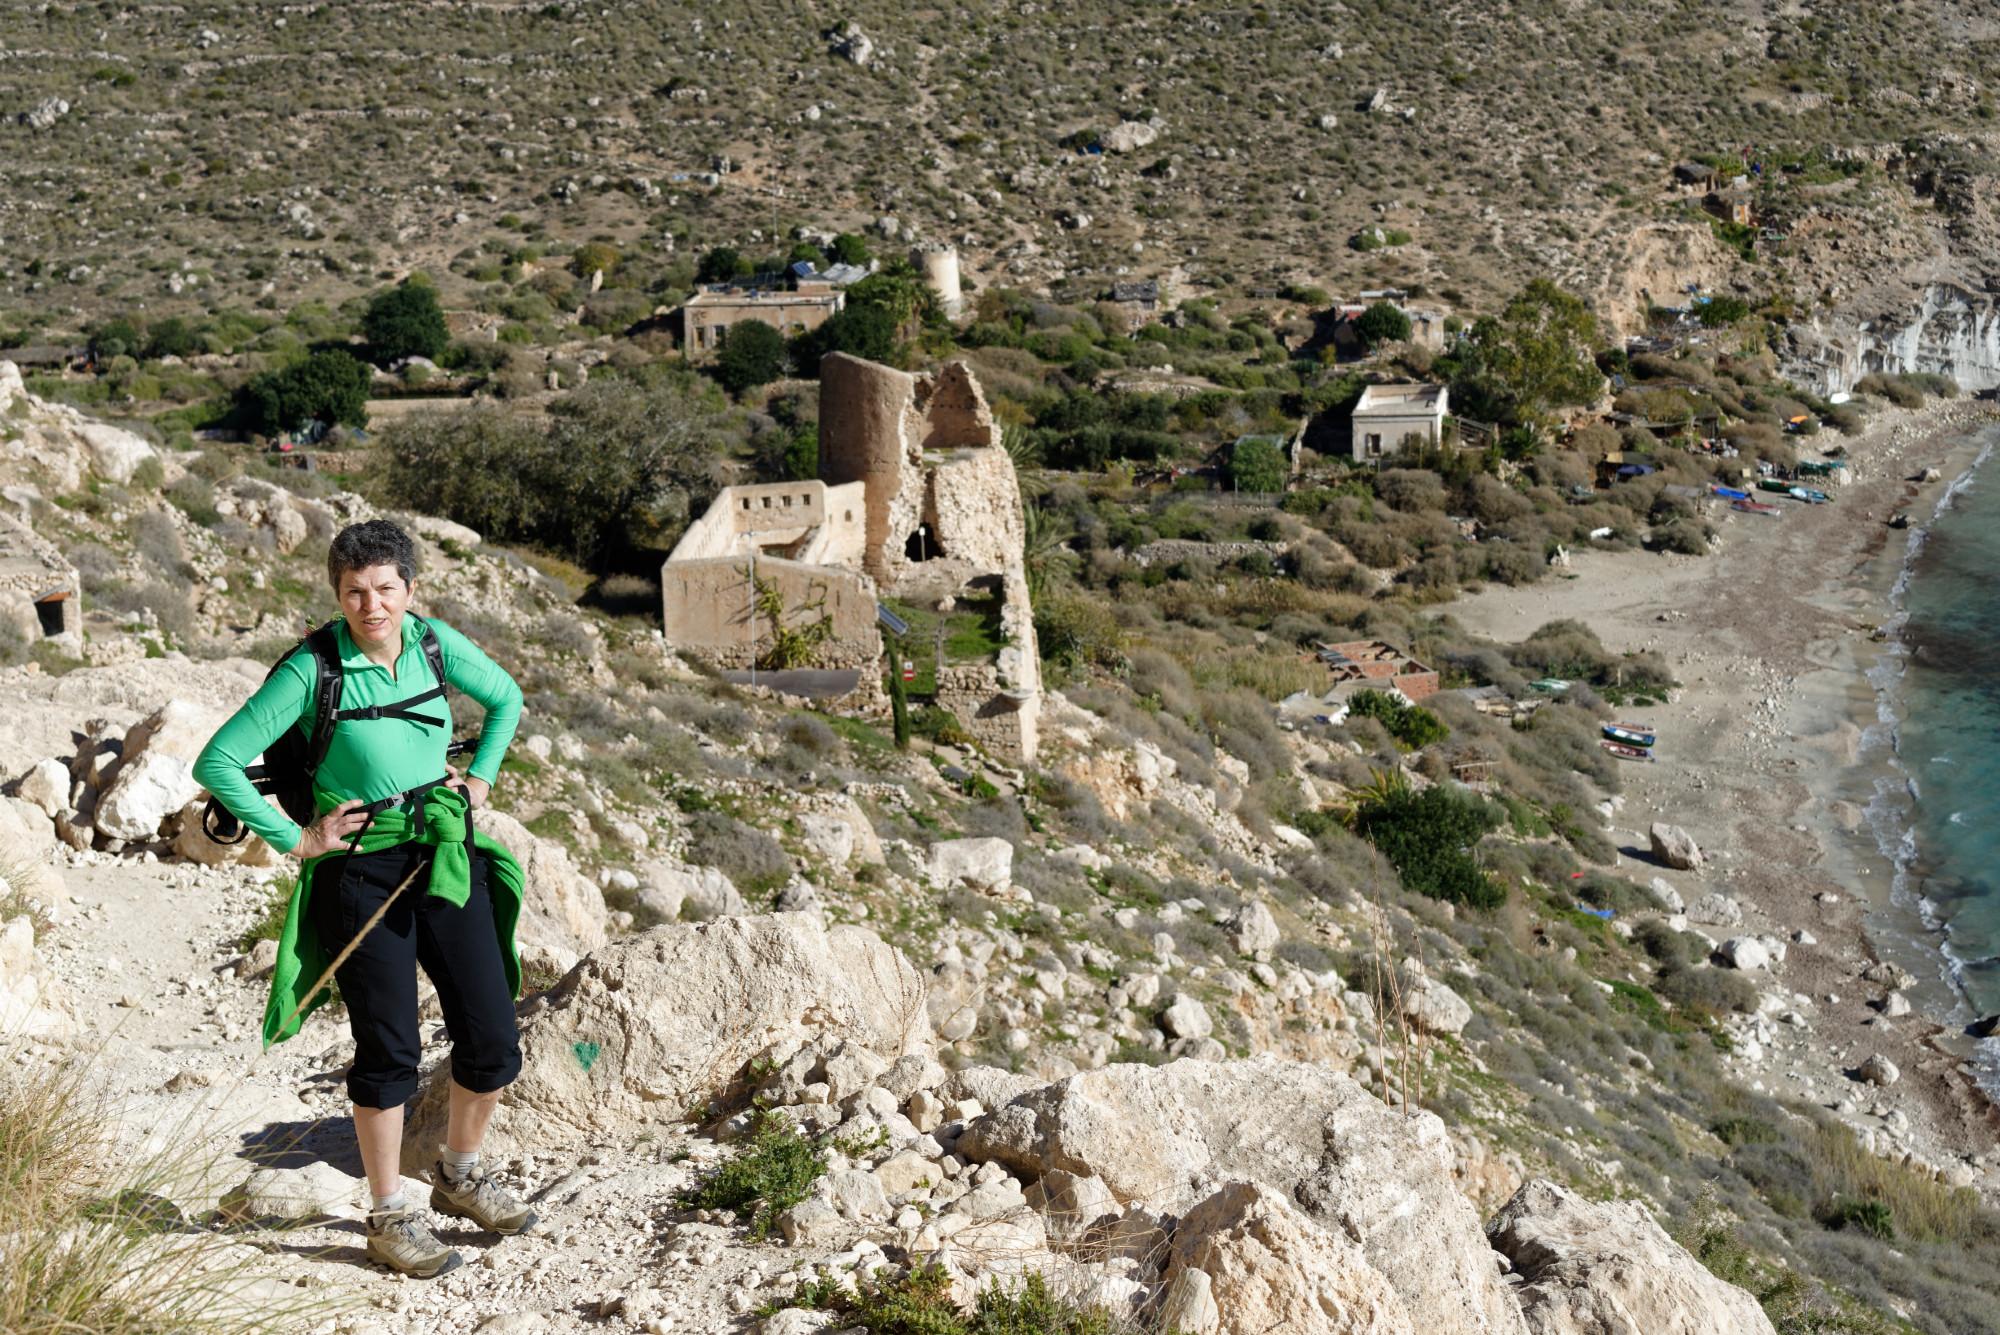 171213-Marche Las Negras-Cala San Pedro-Las Negras (88) (Cabo de Gata-Andalousie)